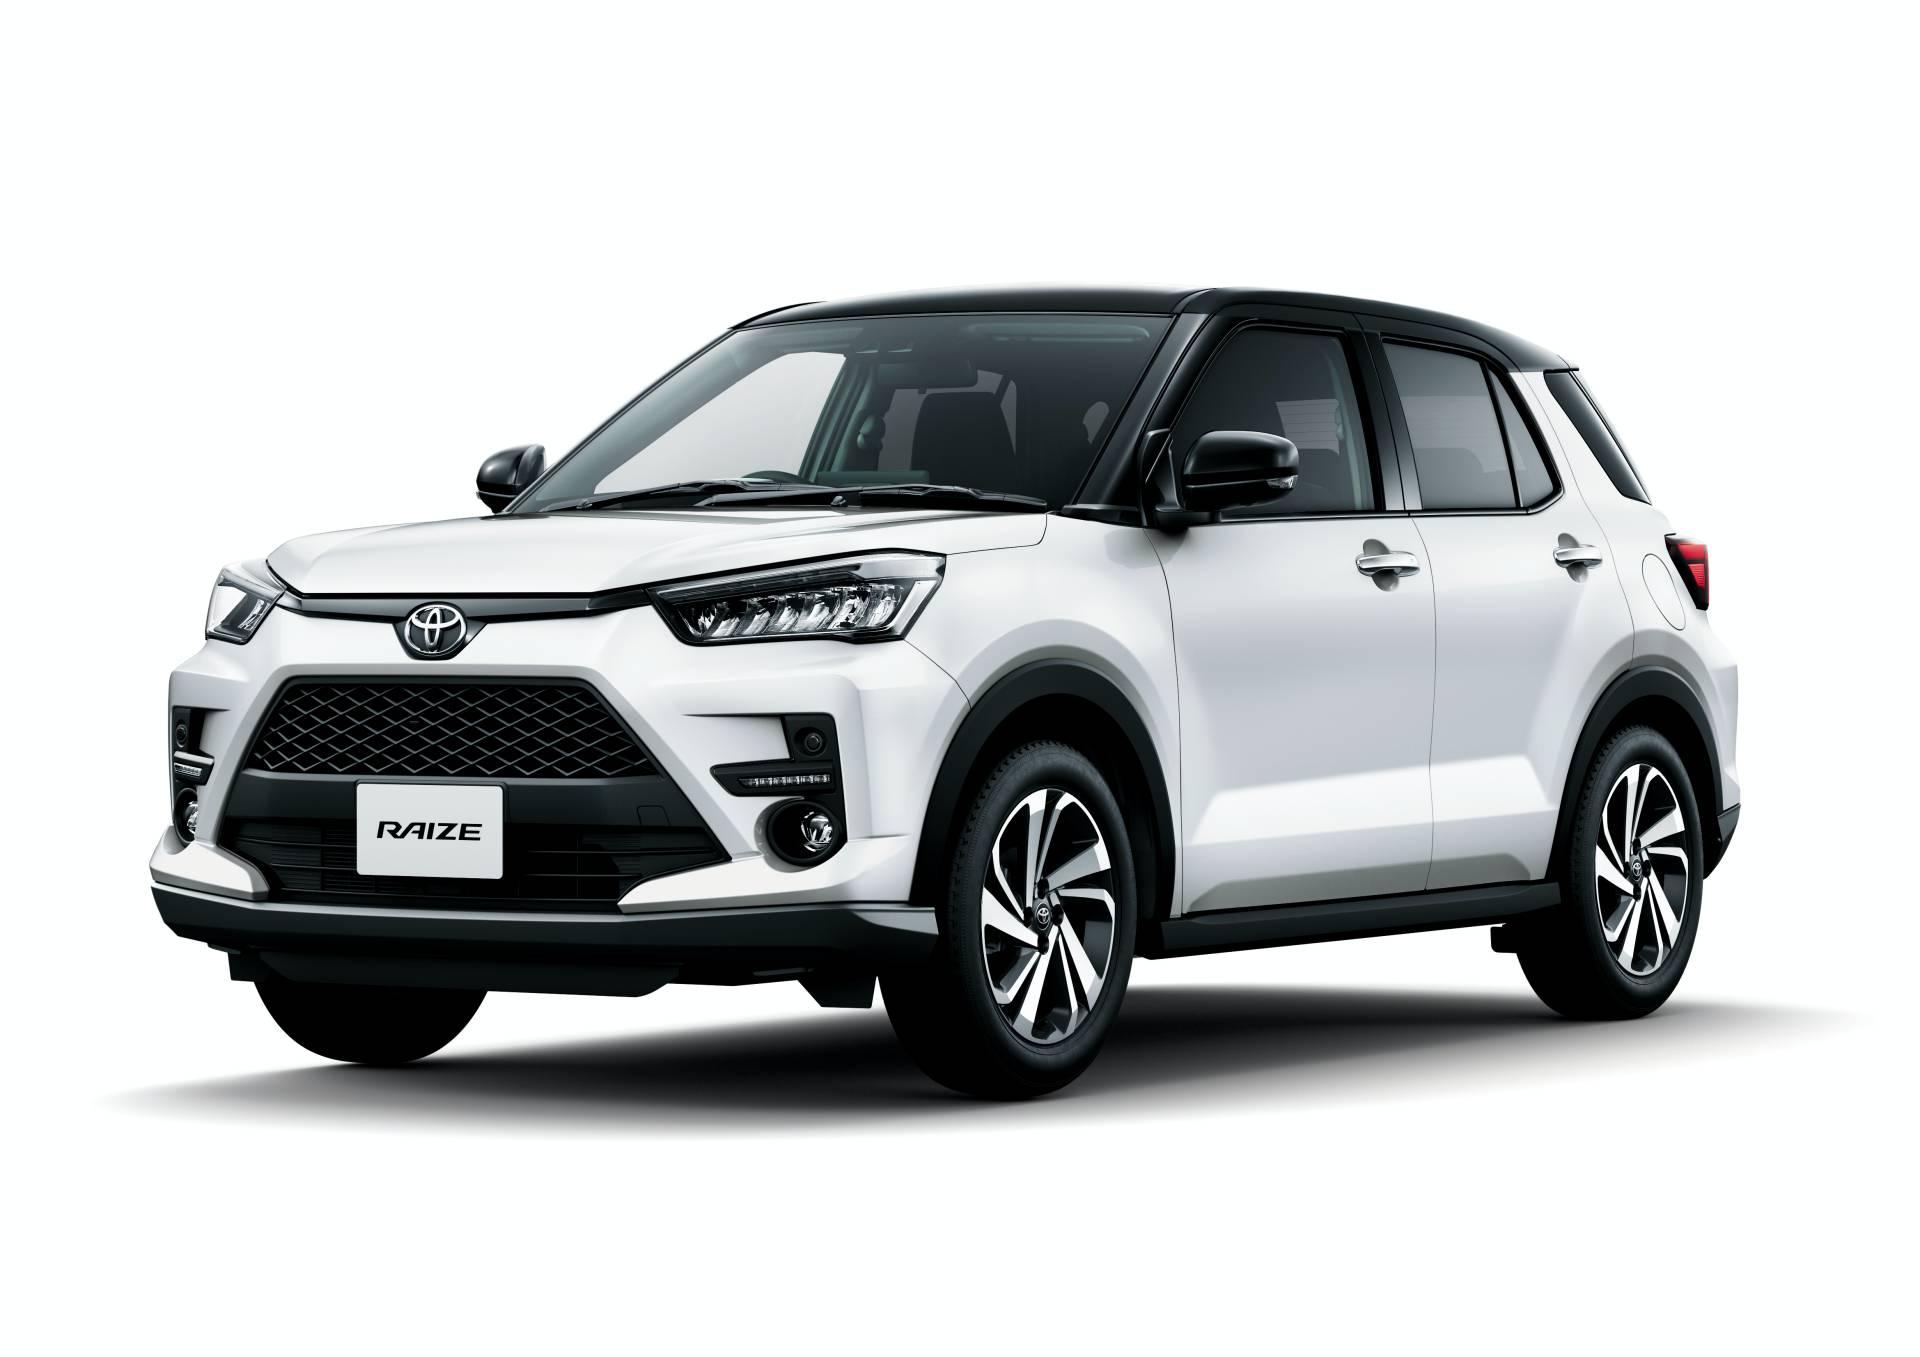 2020_Toyota_Raize_0033